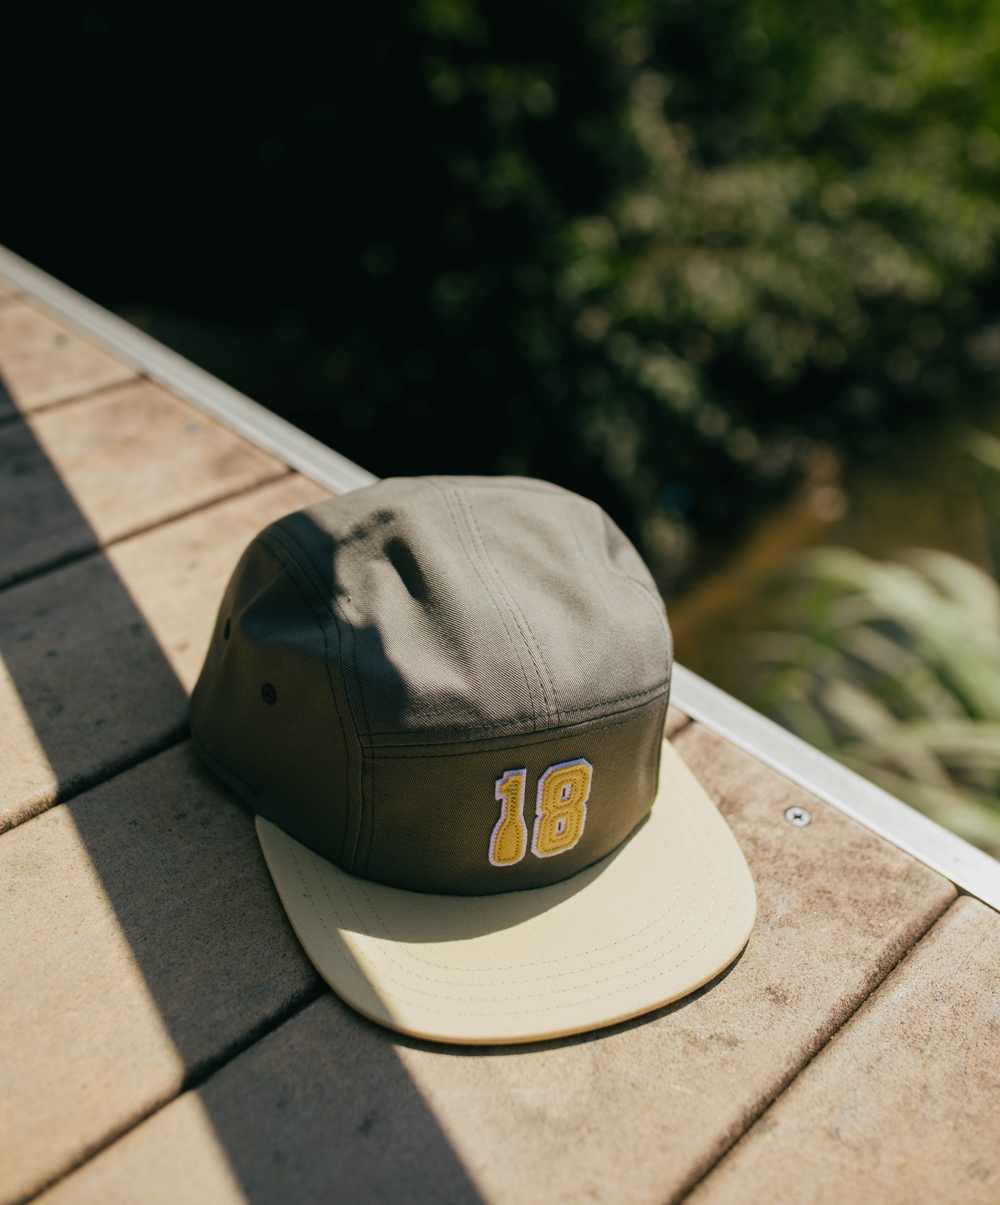 Serene 18 Five Panel Hat resting on a dock